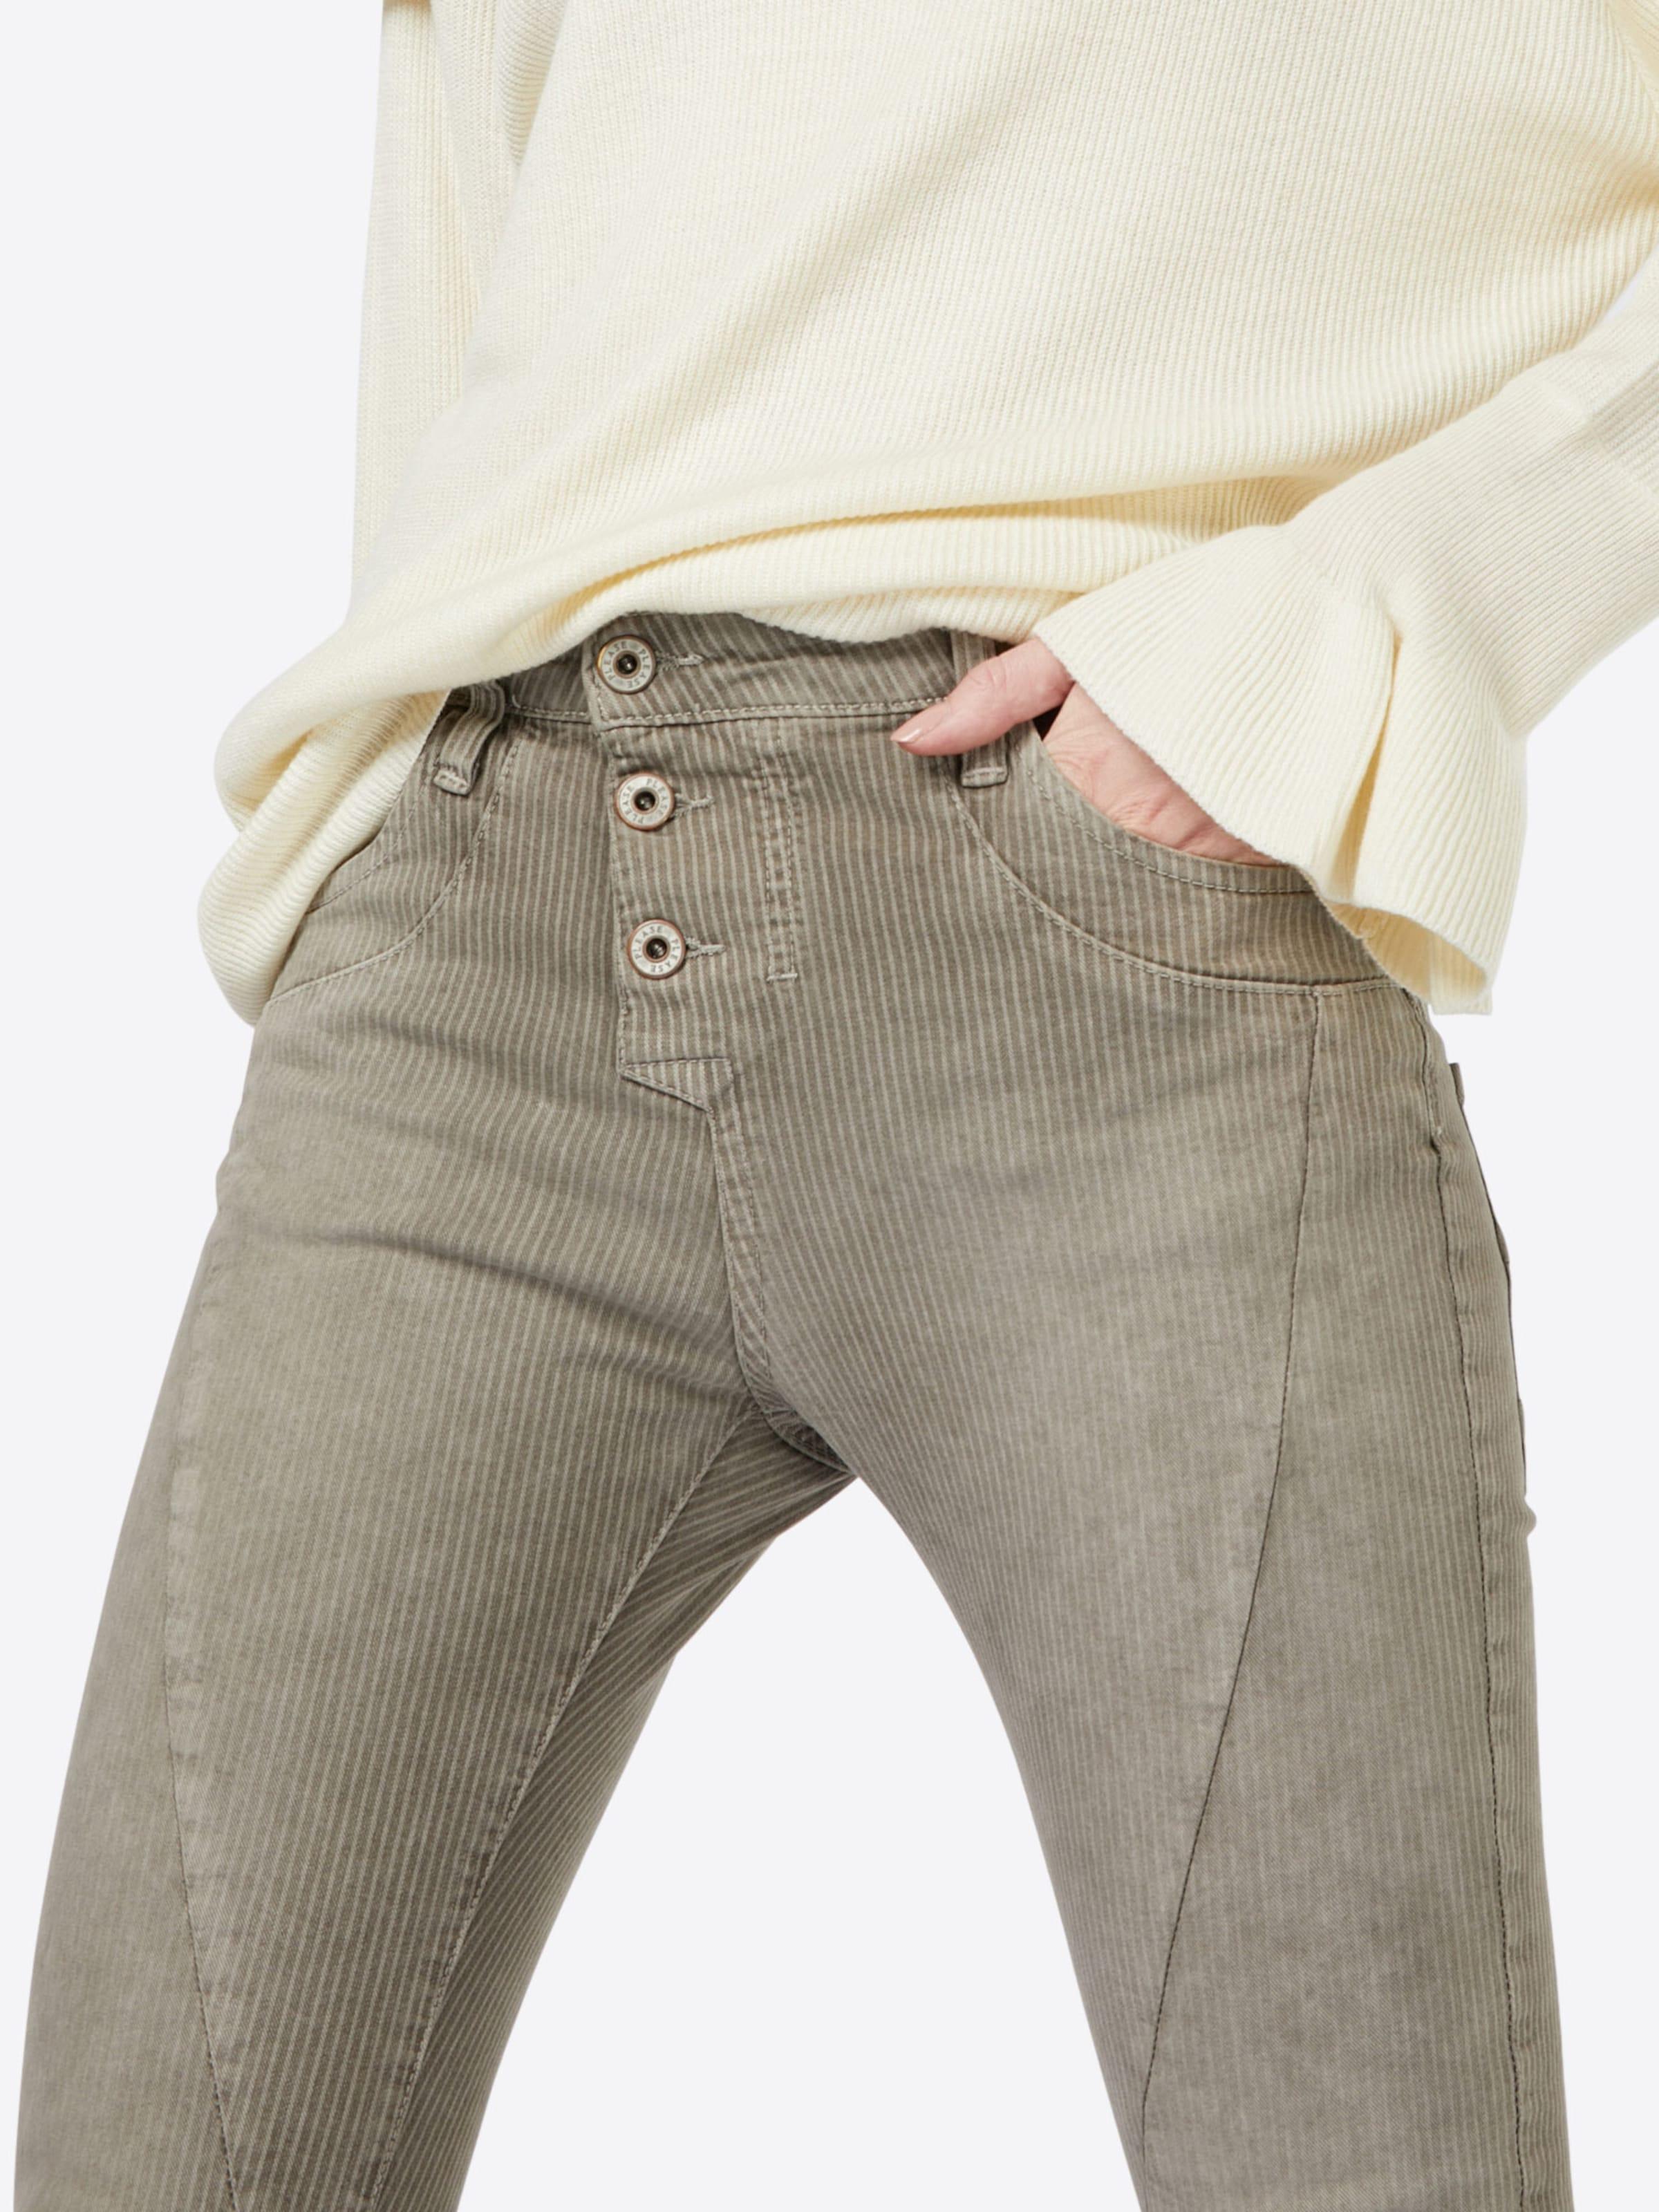 'trousers' Jeans PLEASE Jeans PLEASE PLEASE 'trousers' Jeans PLEASE 'trousers' C6w0WqF